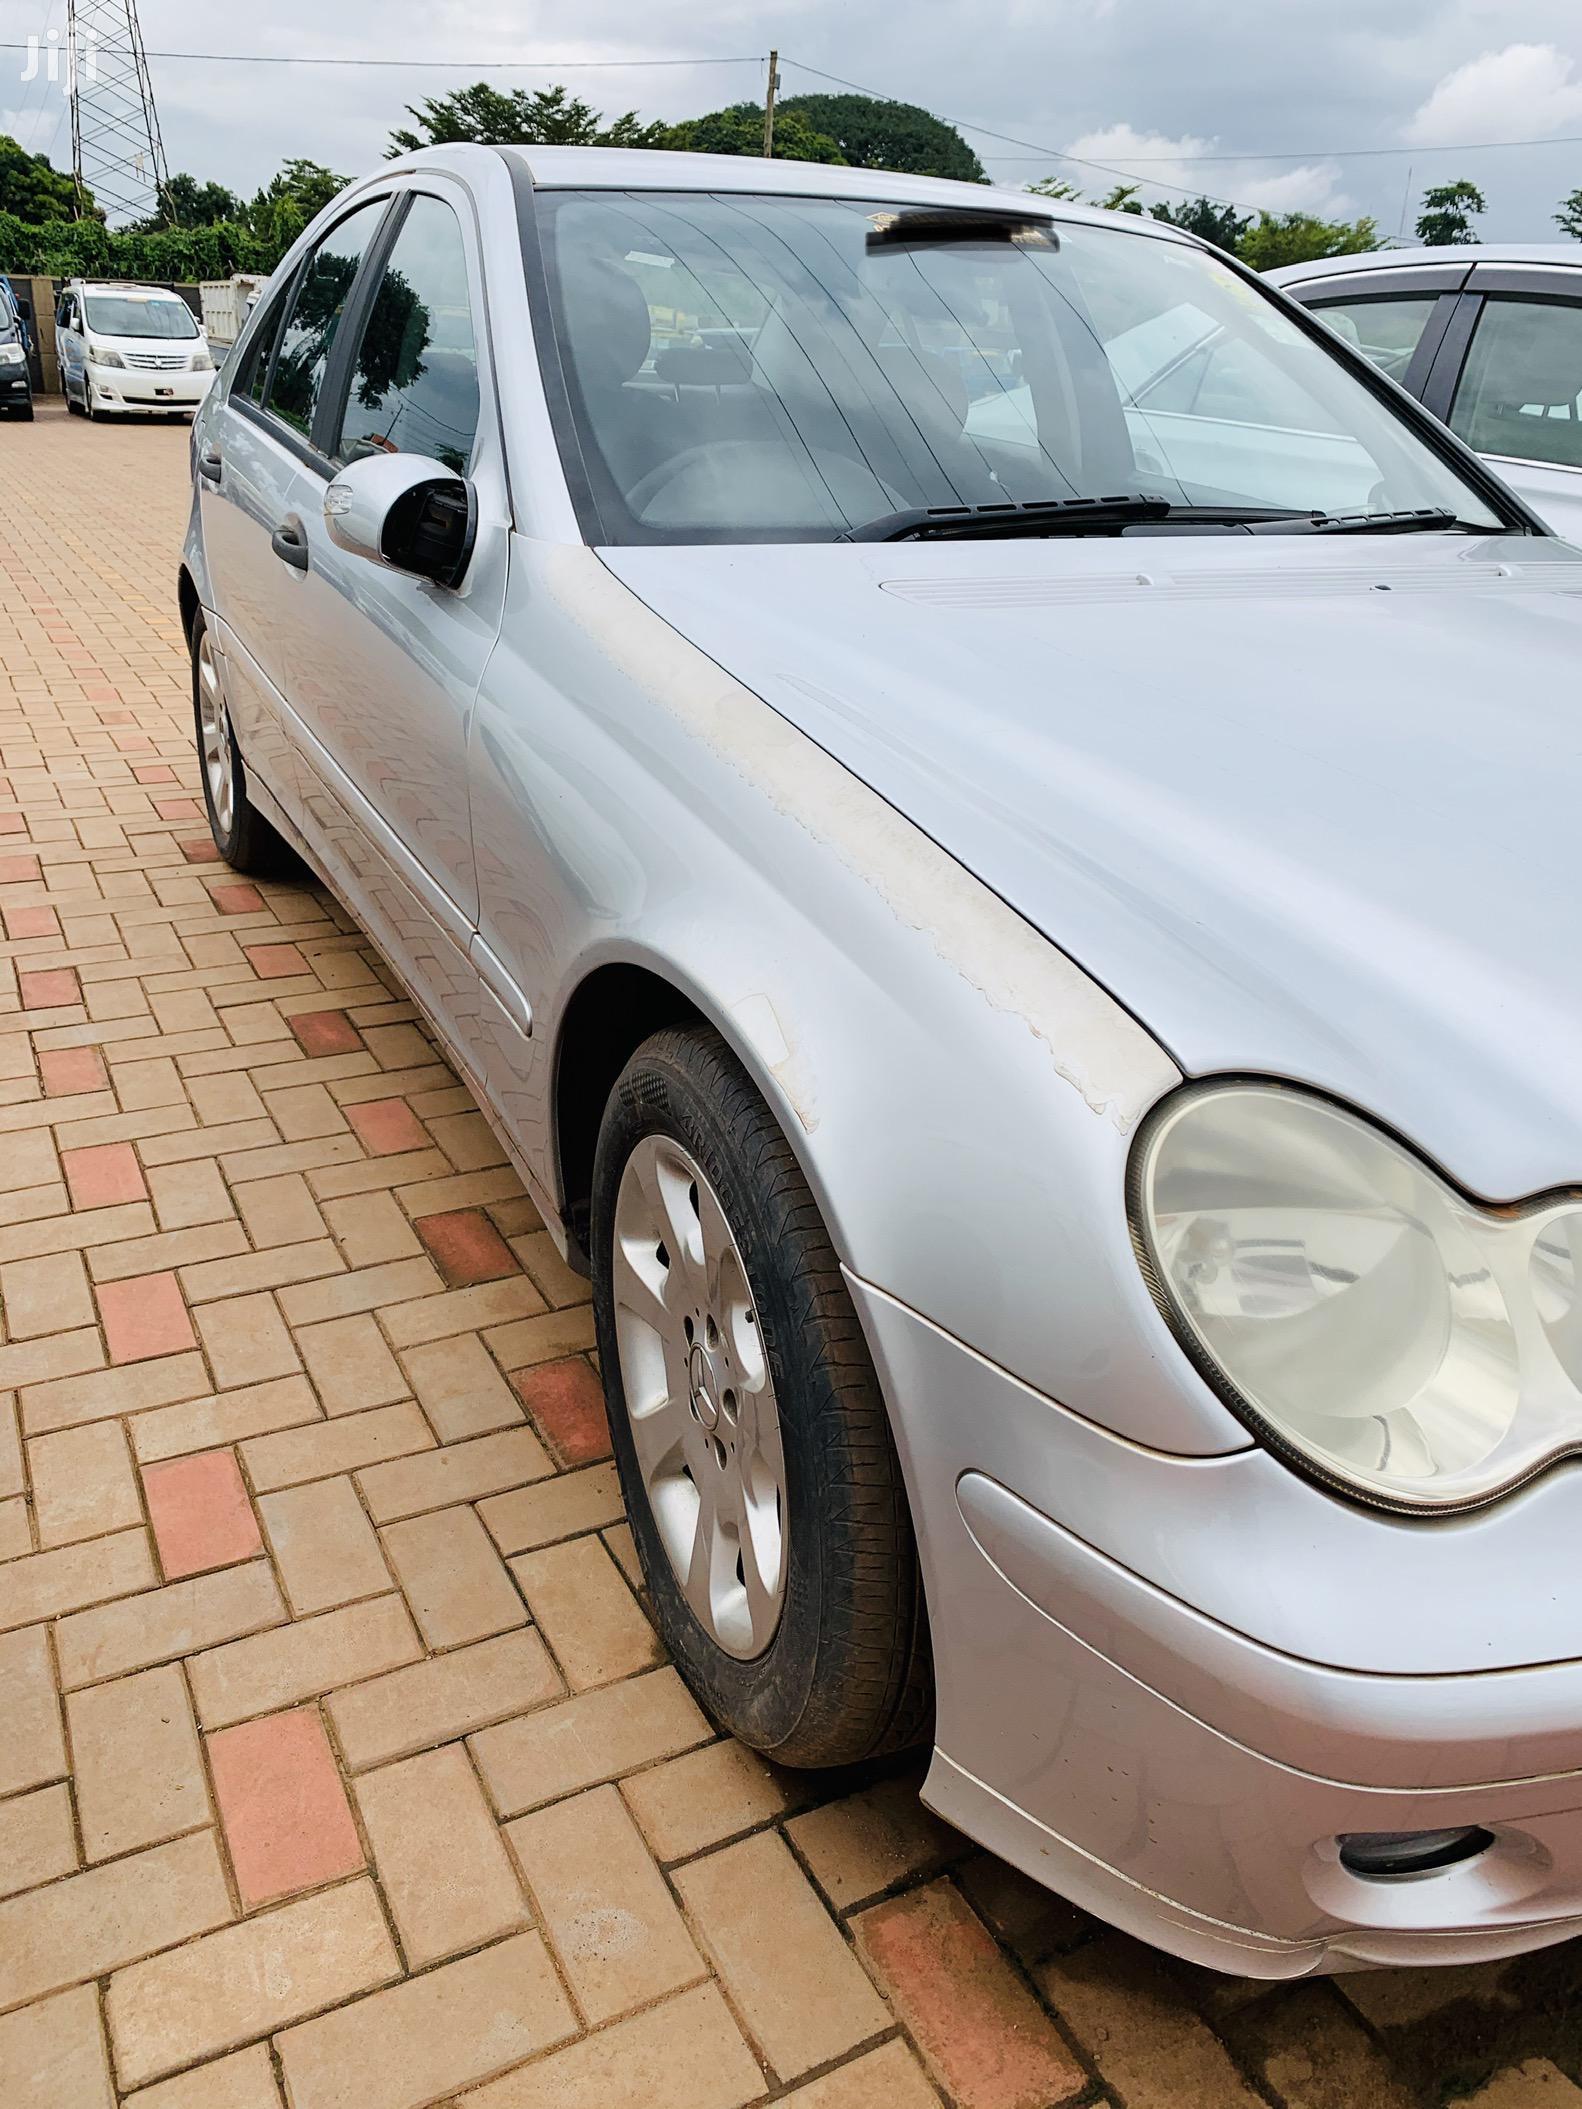 Mercedes-Benz C180 2005 Silver | Cars for sale in Kampala, Central Region, Uganda